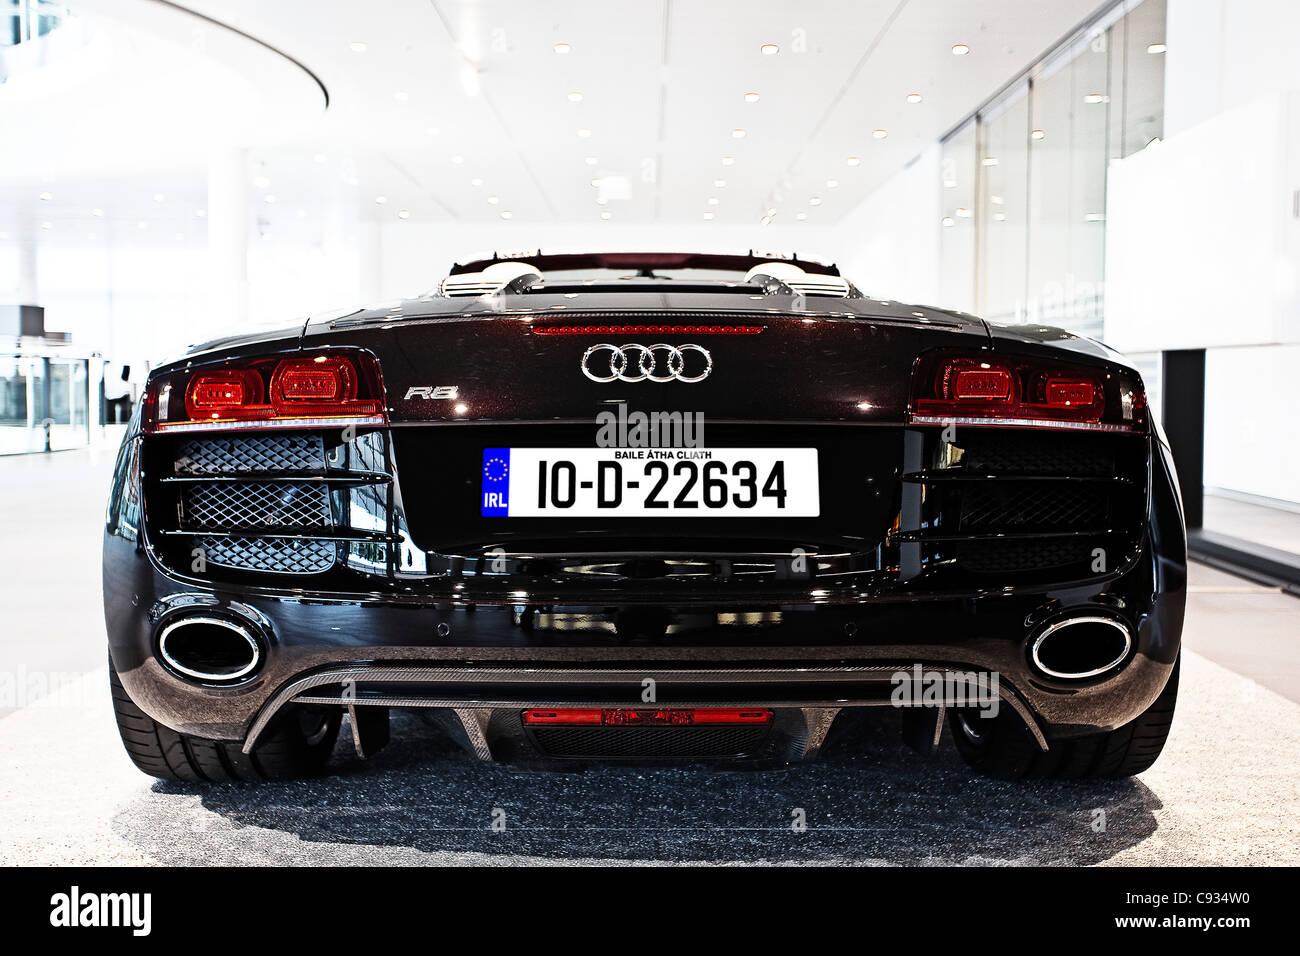 Beau Rear View Of Audi R8 V10 Quattro Super Sports Car In The Audi Forum In  Neckarslum